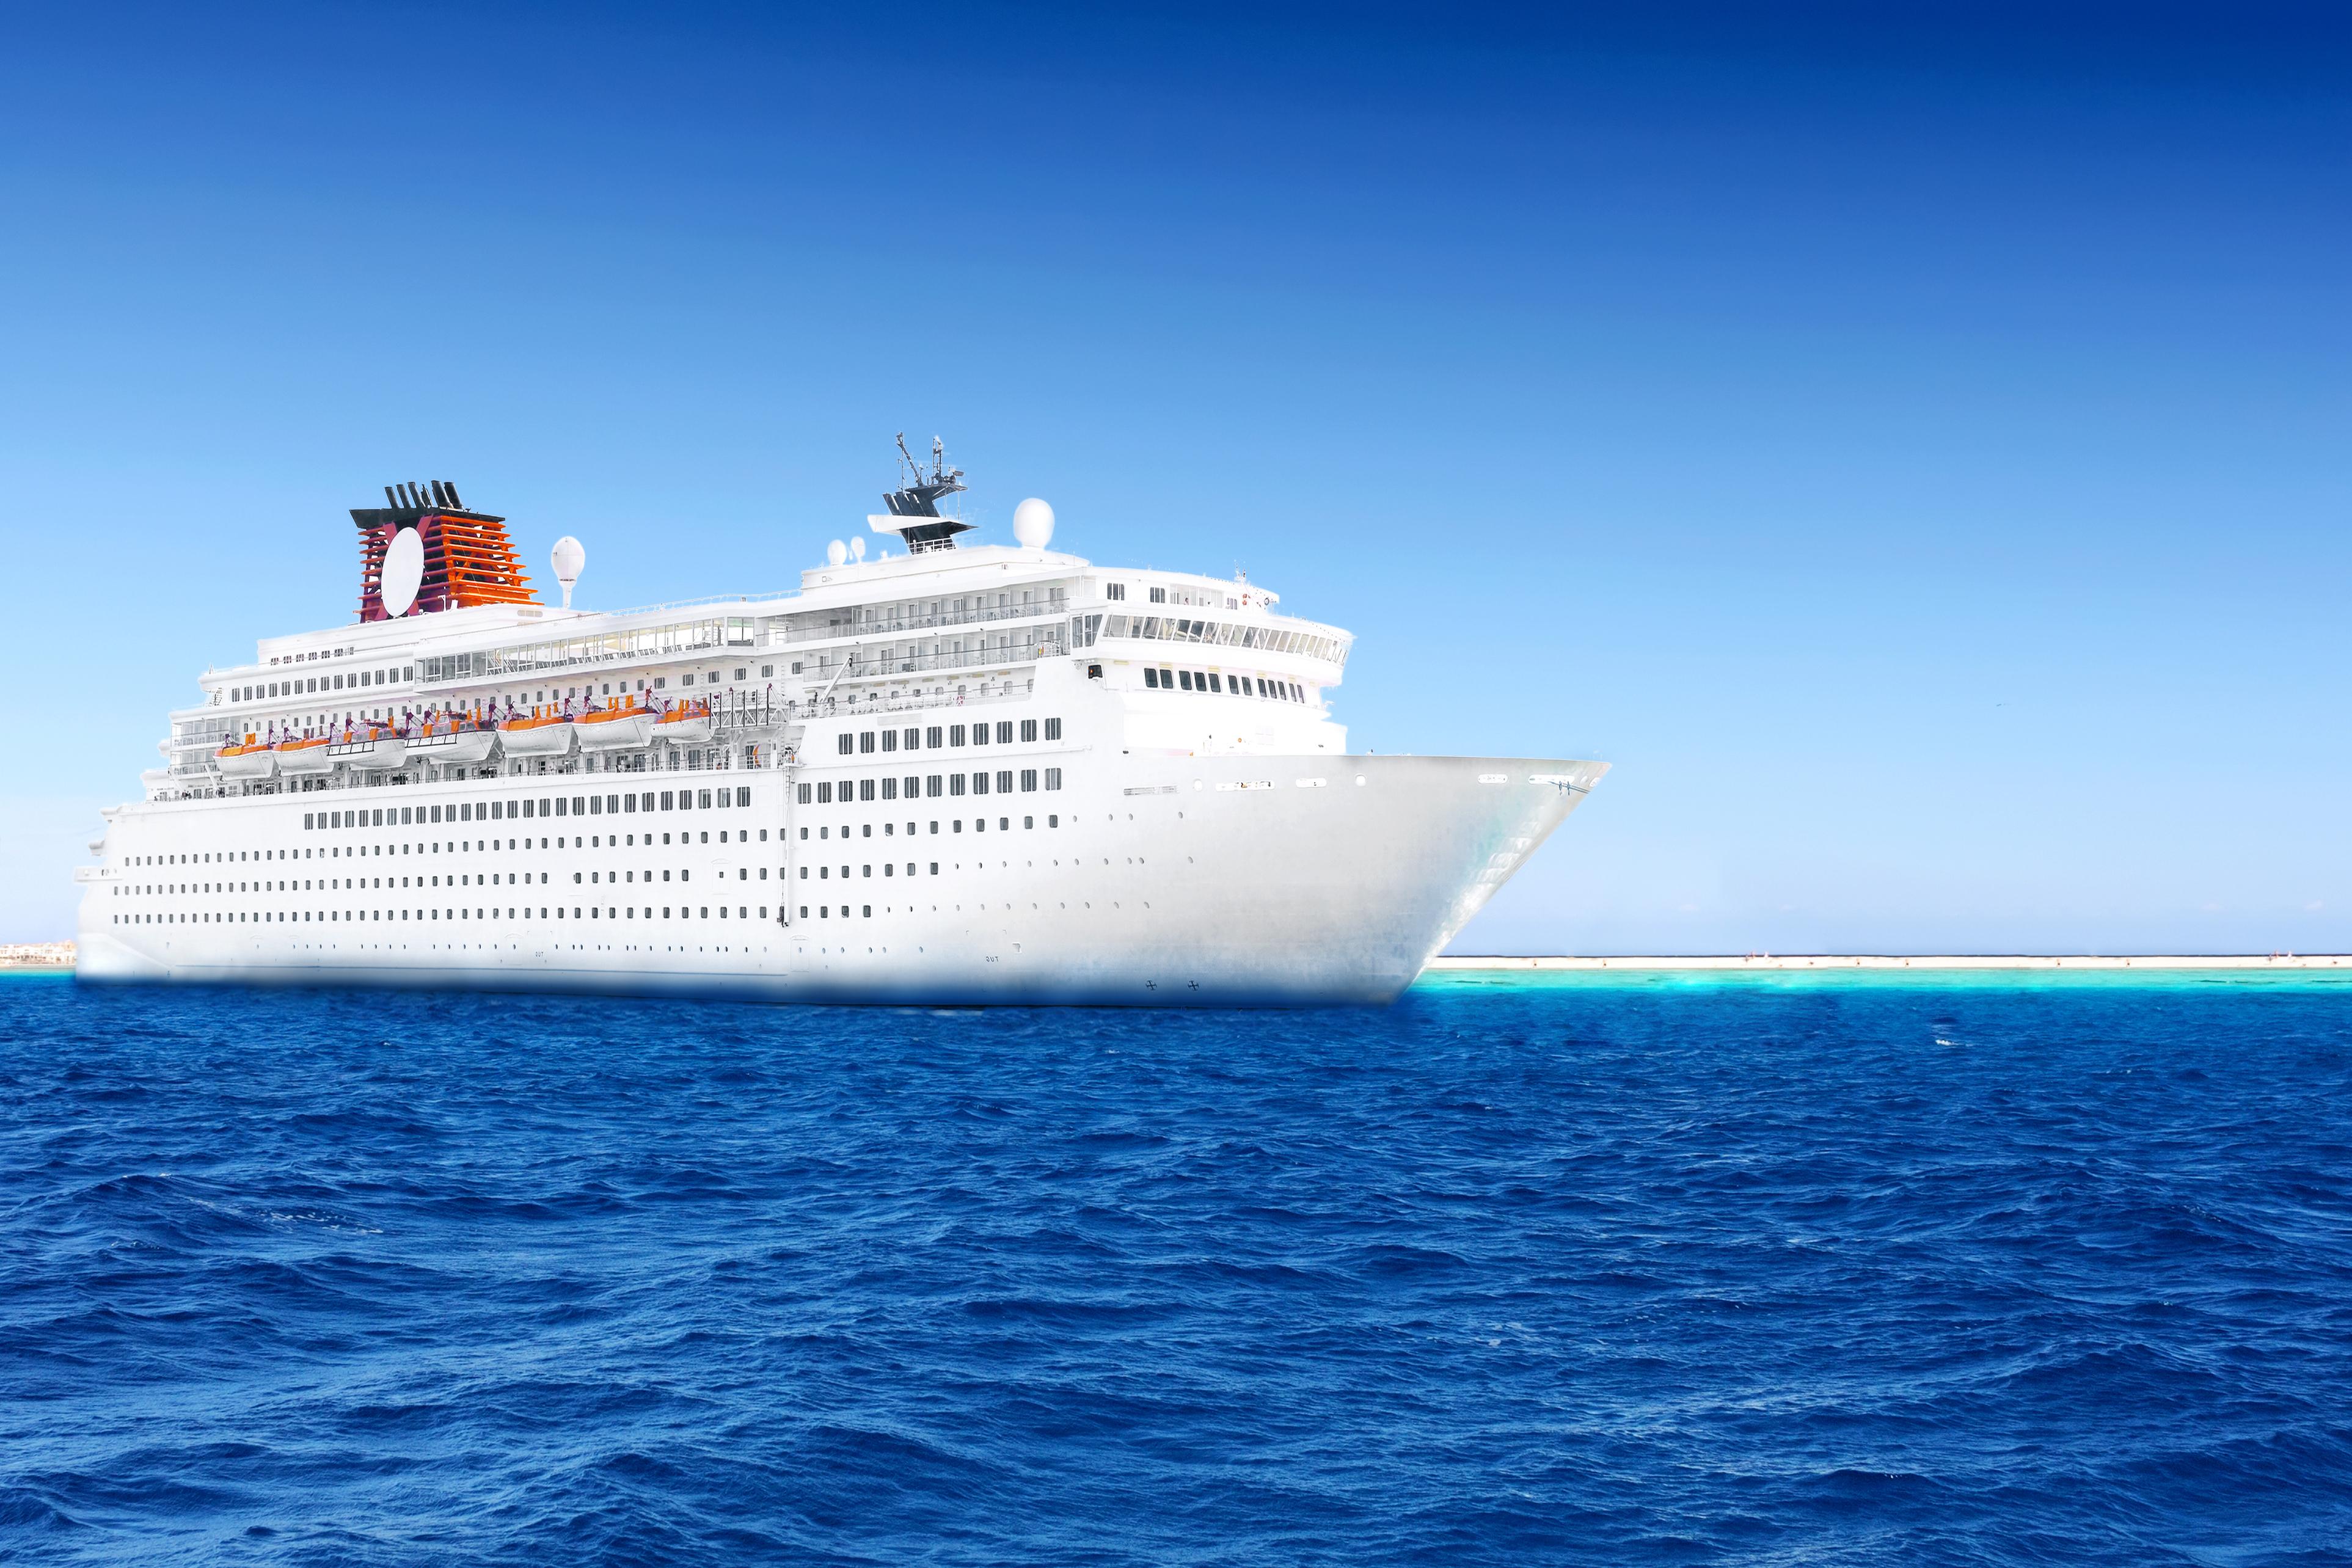 A cruise ship at sea.